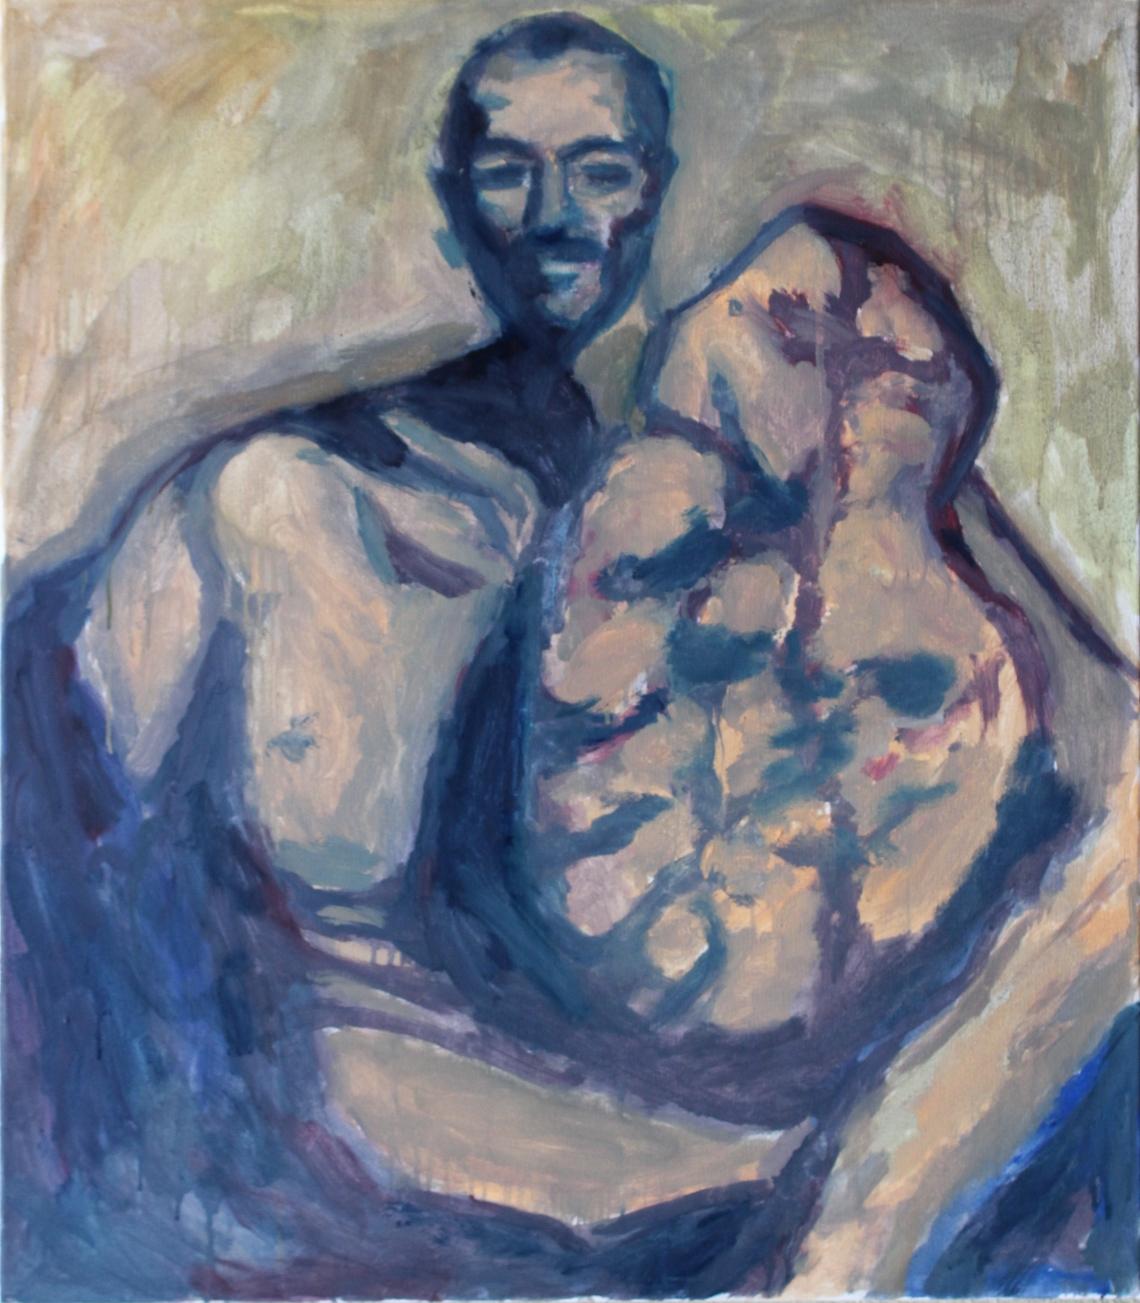 man with tumour